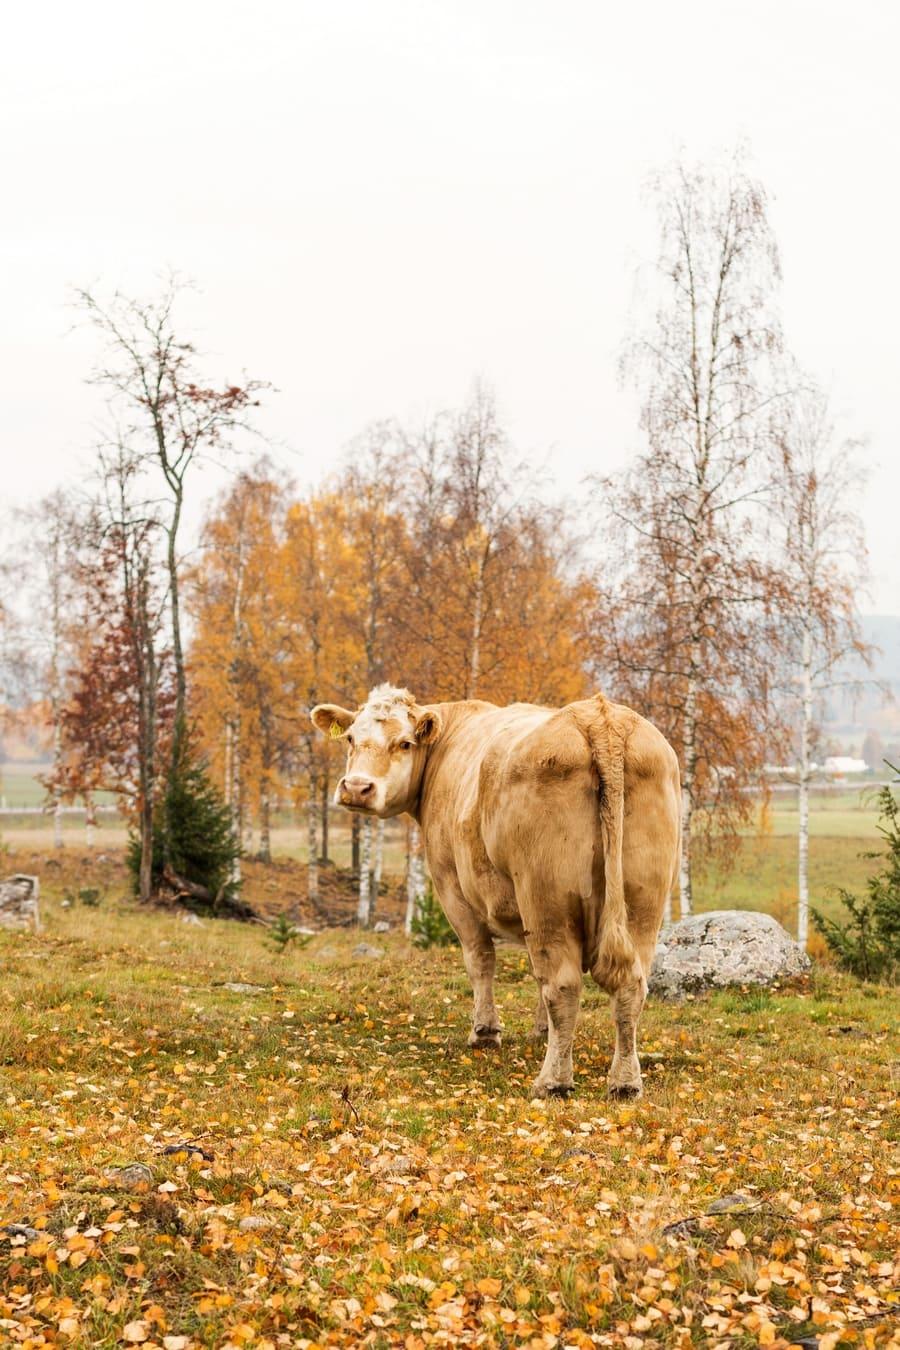 Cows at Murboannas Borlänge